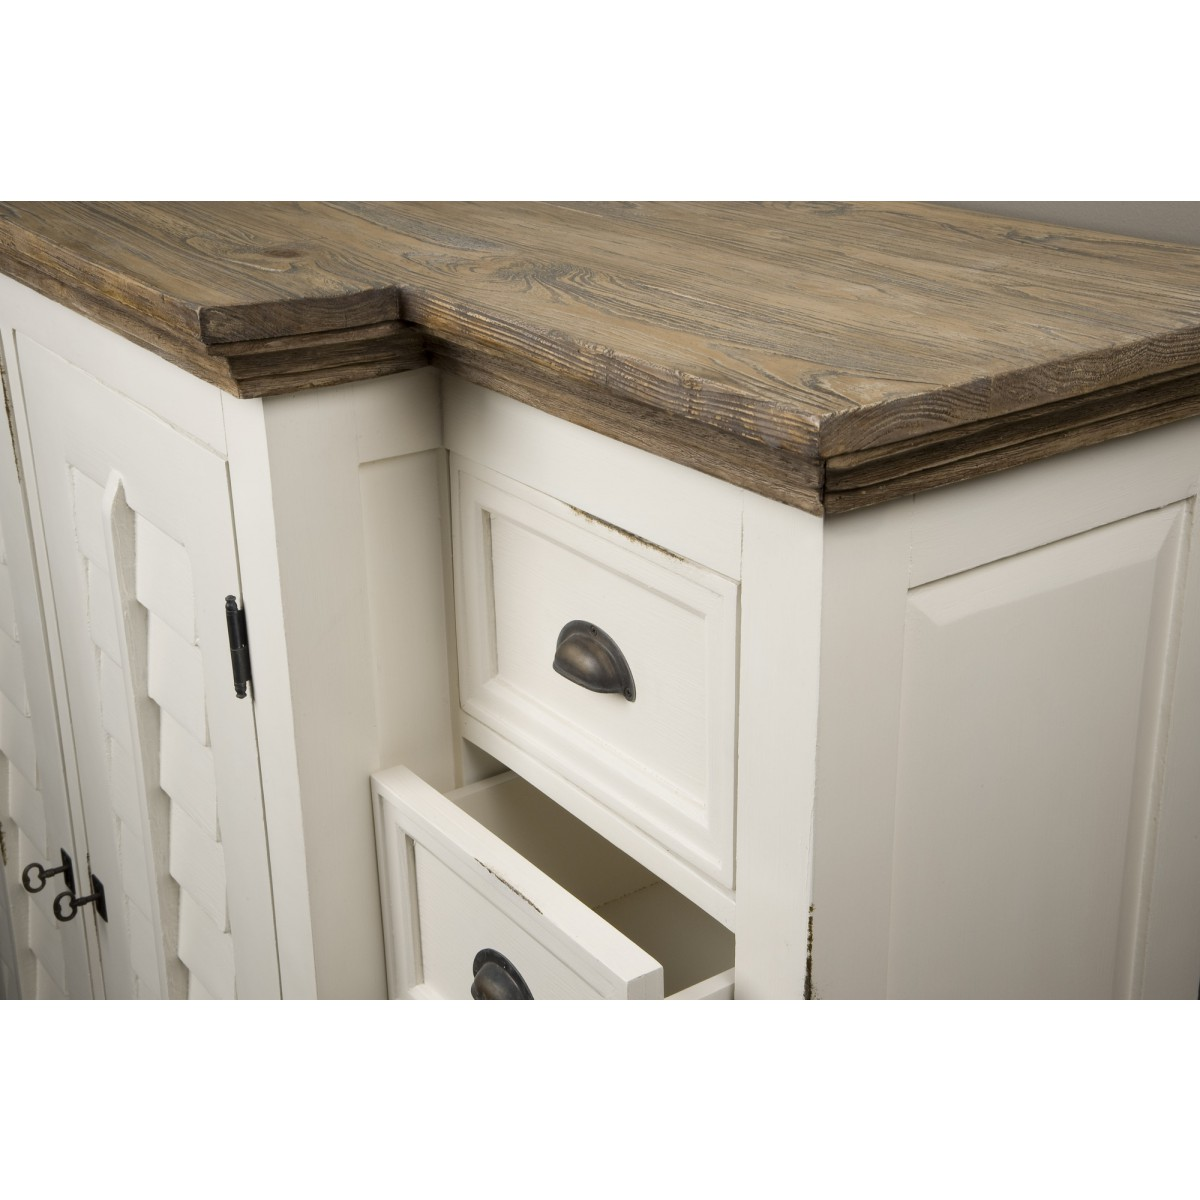 palermo-dressoir-louvre-deur-old-pine-wit-gelakt